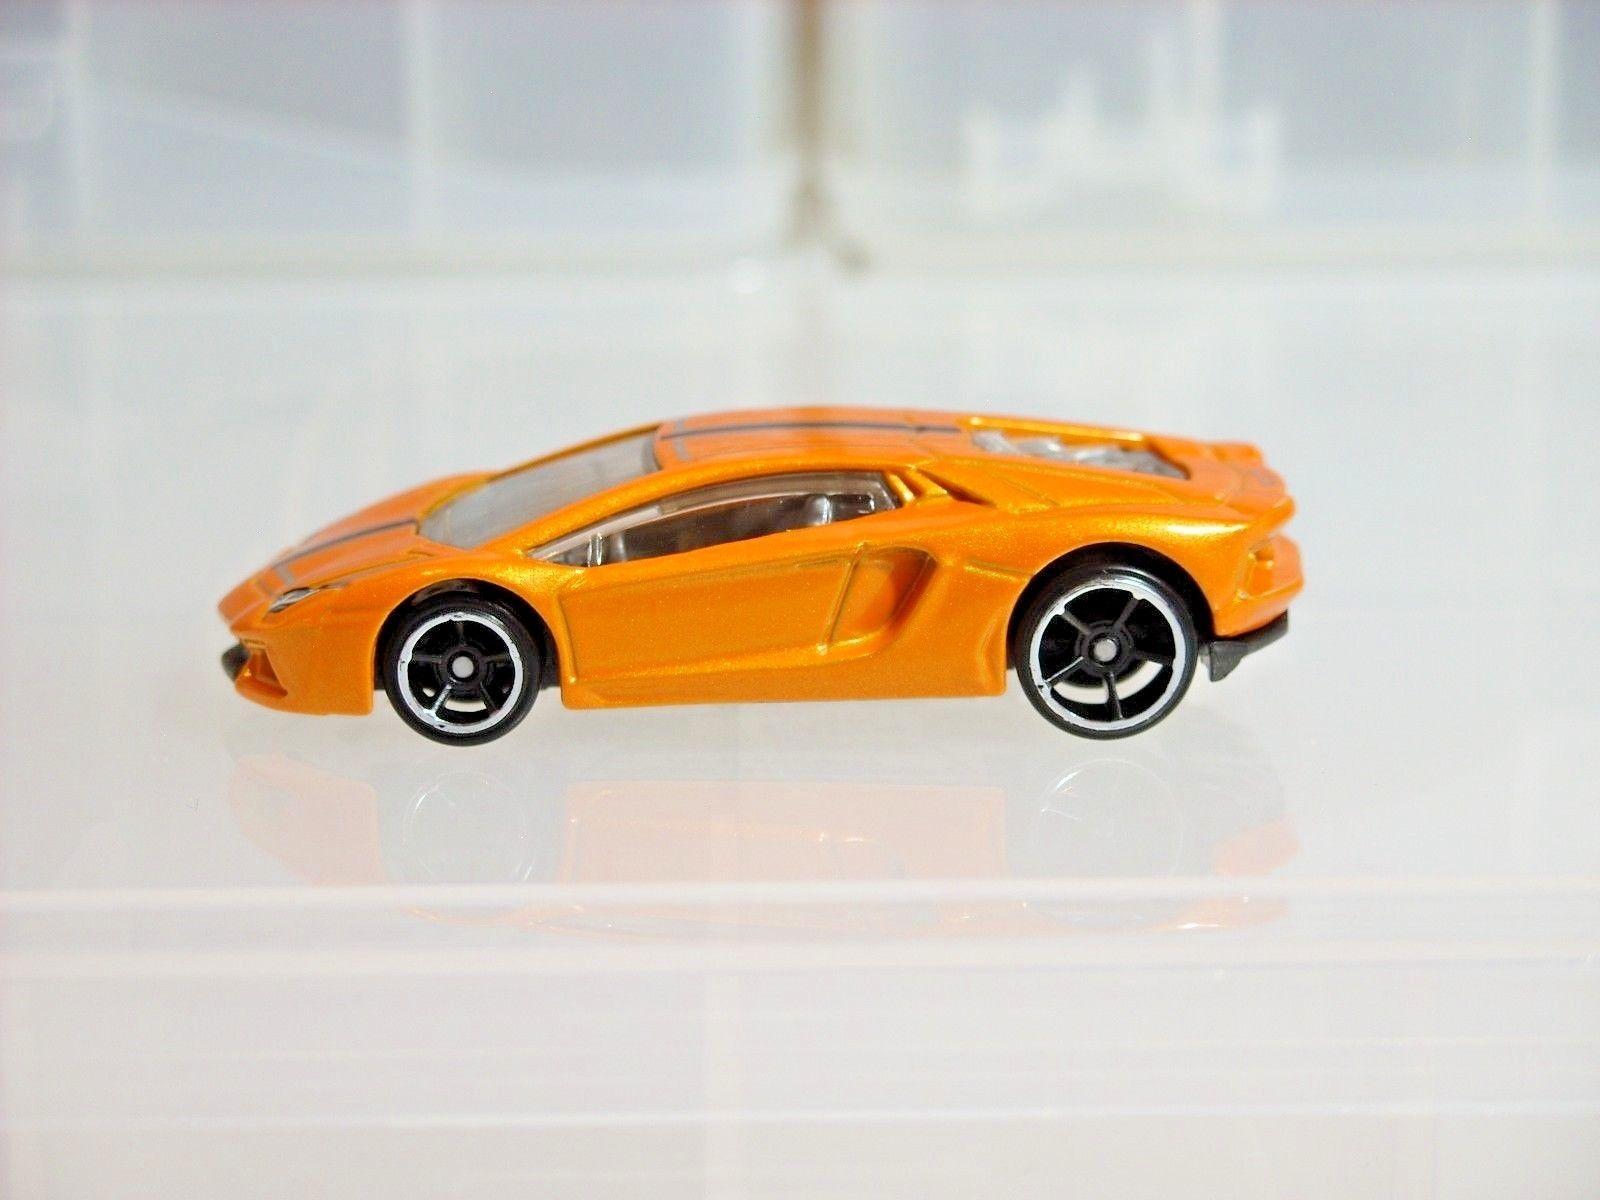 Awesome Hot Wheels / Lamborghini Aventador LP 700-4 / Orange / Exotics 5 Pack ~ 2016 #5 2017 2018